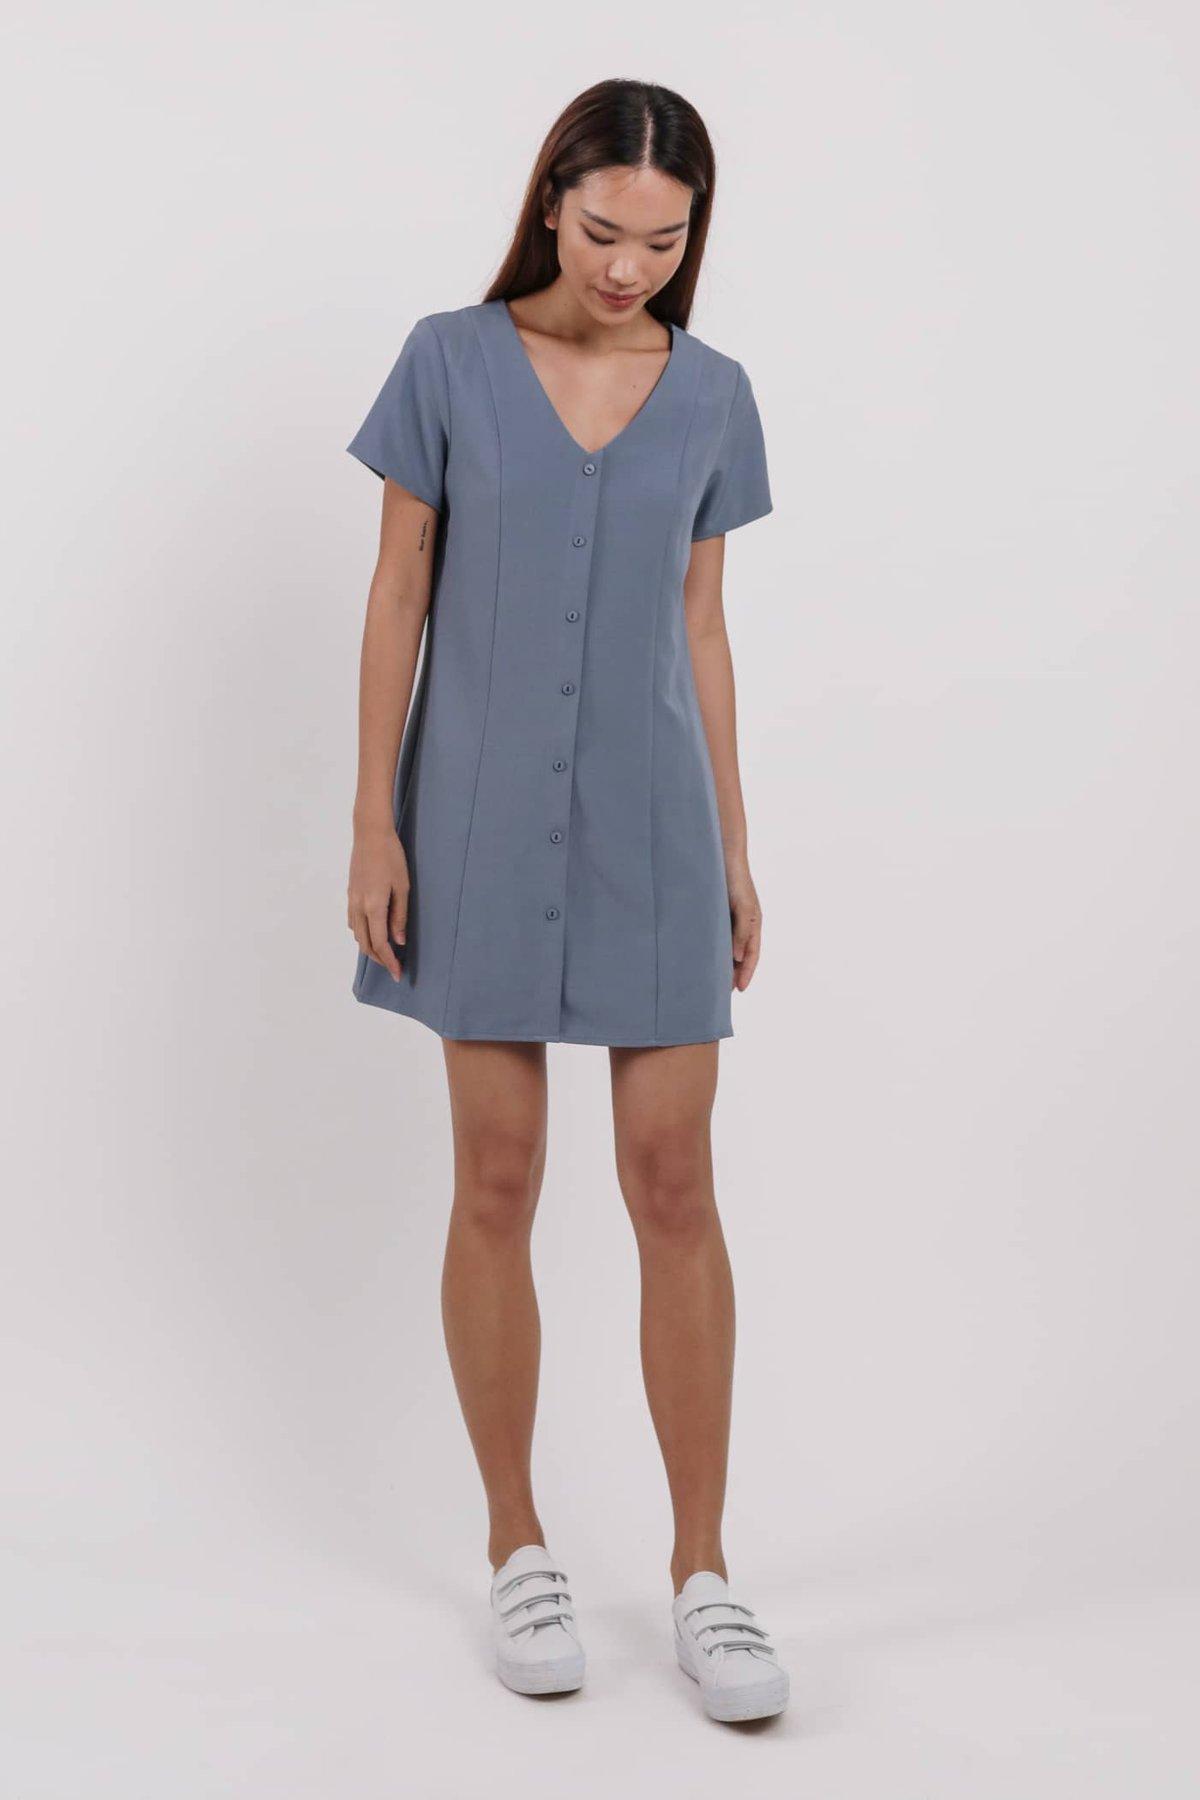 Nally Sleeved Dress (Dusty Blue)